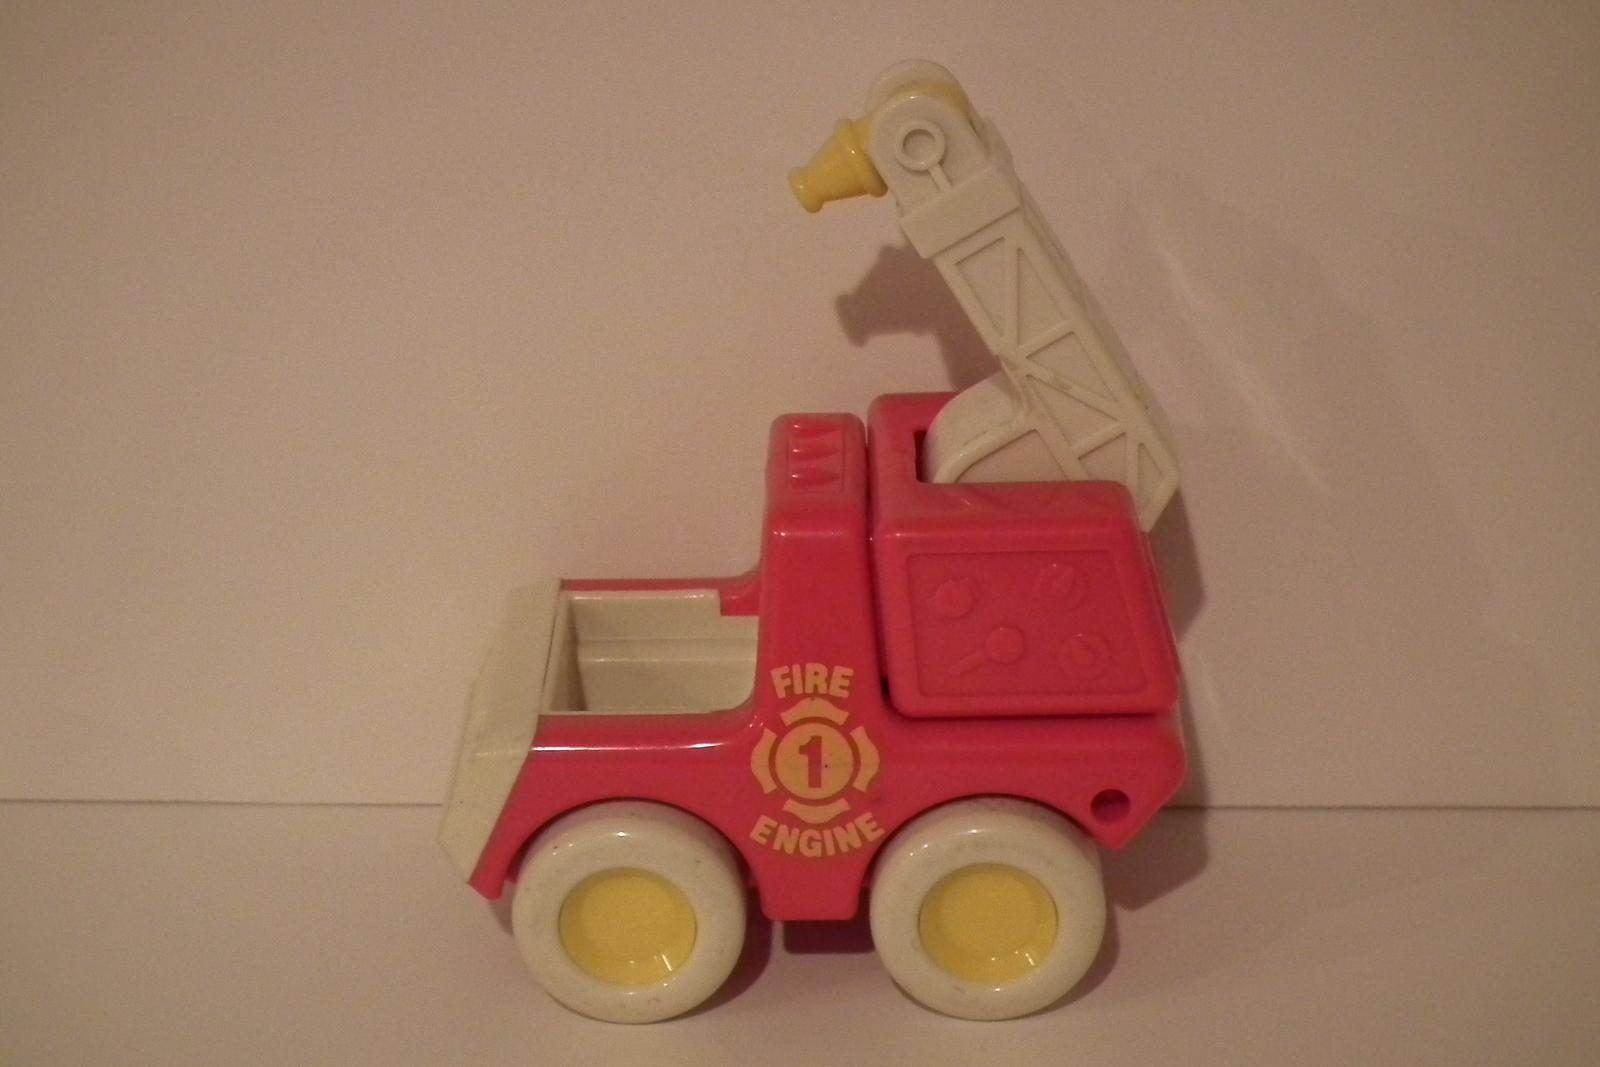 Vintage Plastic Tonka Fire Truck and 50 similar items